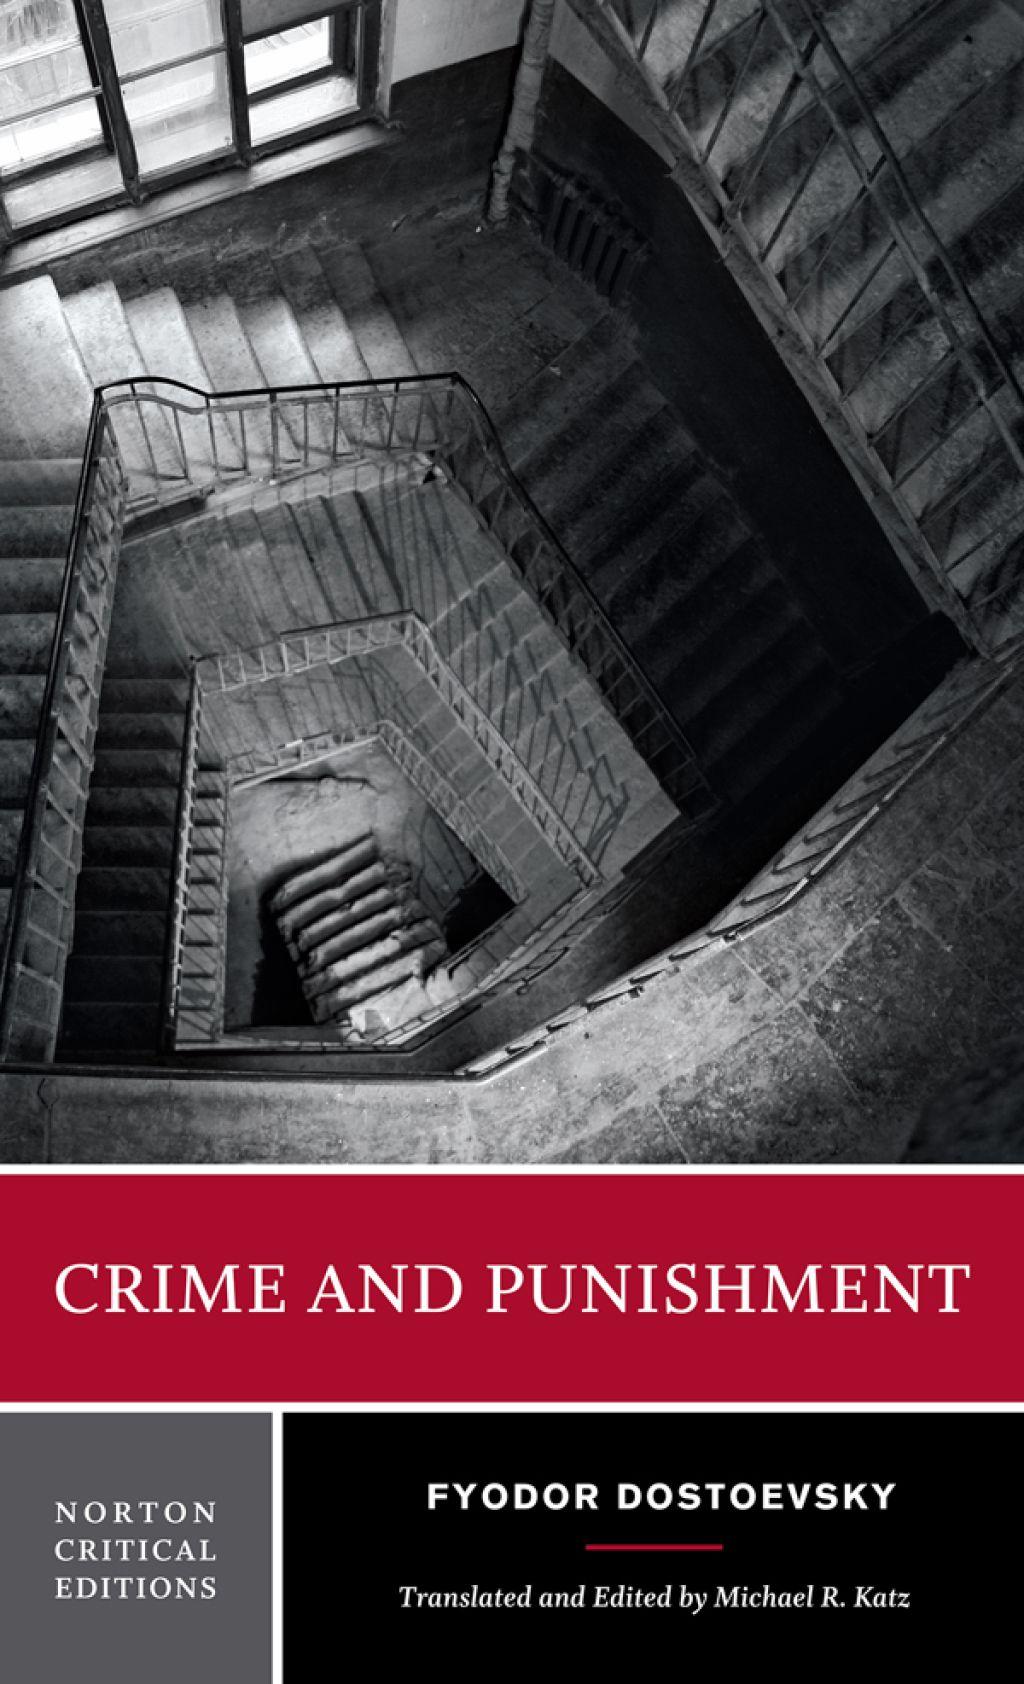 Crime And Punishment A Norton Critical Edition First Edition Ebook Fyodor Dostoyevsky Punishment Dostoyevsky